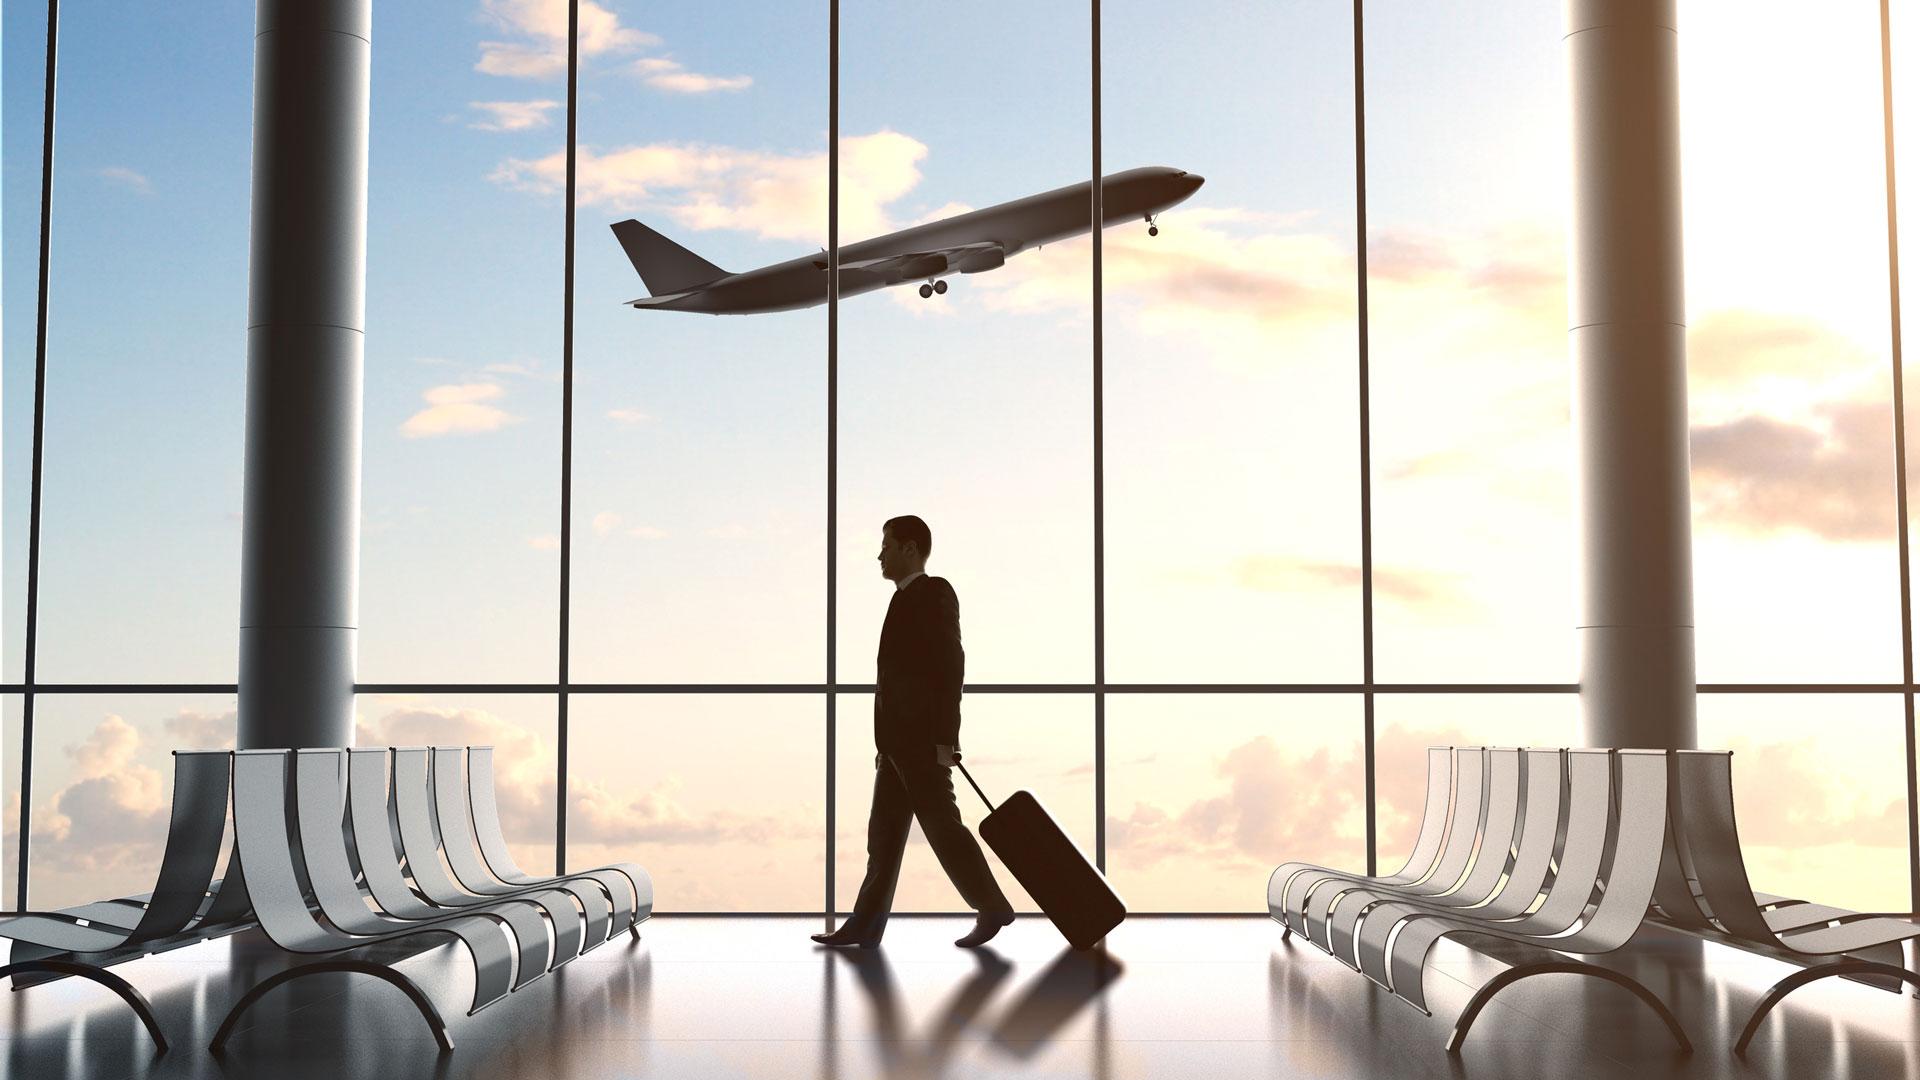 Airport Limousine Vancouver | Airport Limousine Service Vancouver | Airport Limo Vancouver